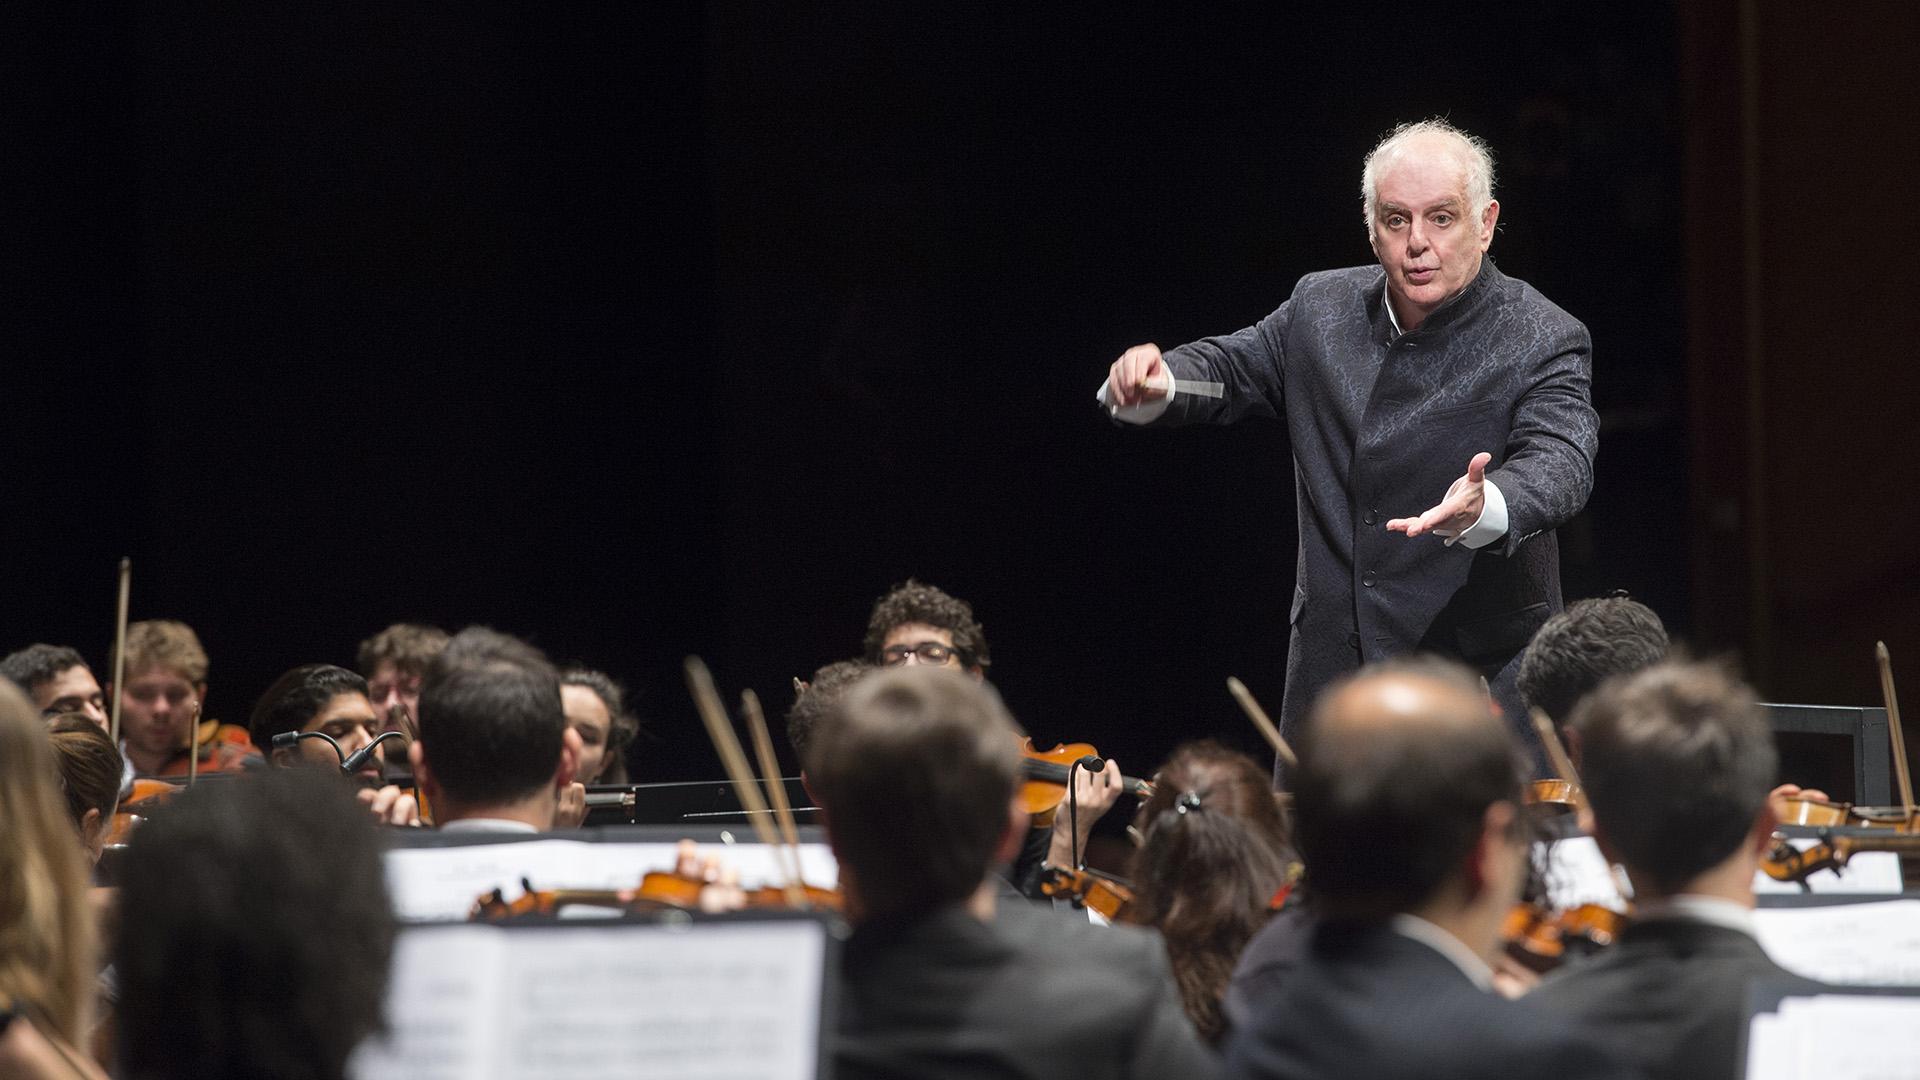 El Maestro Daniel Barenboim